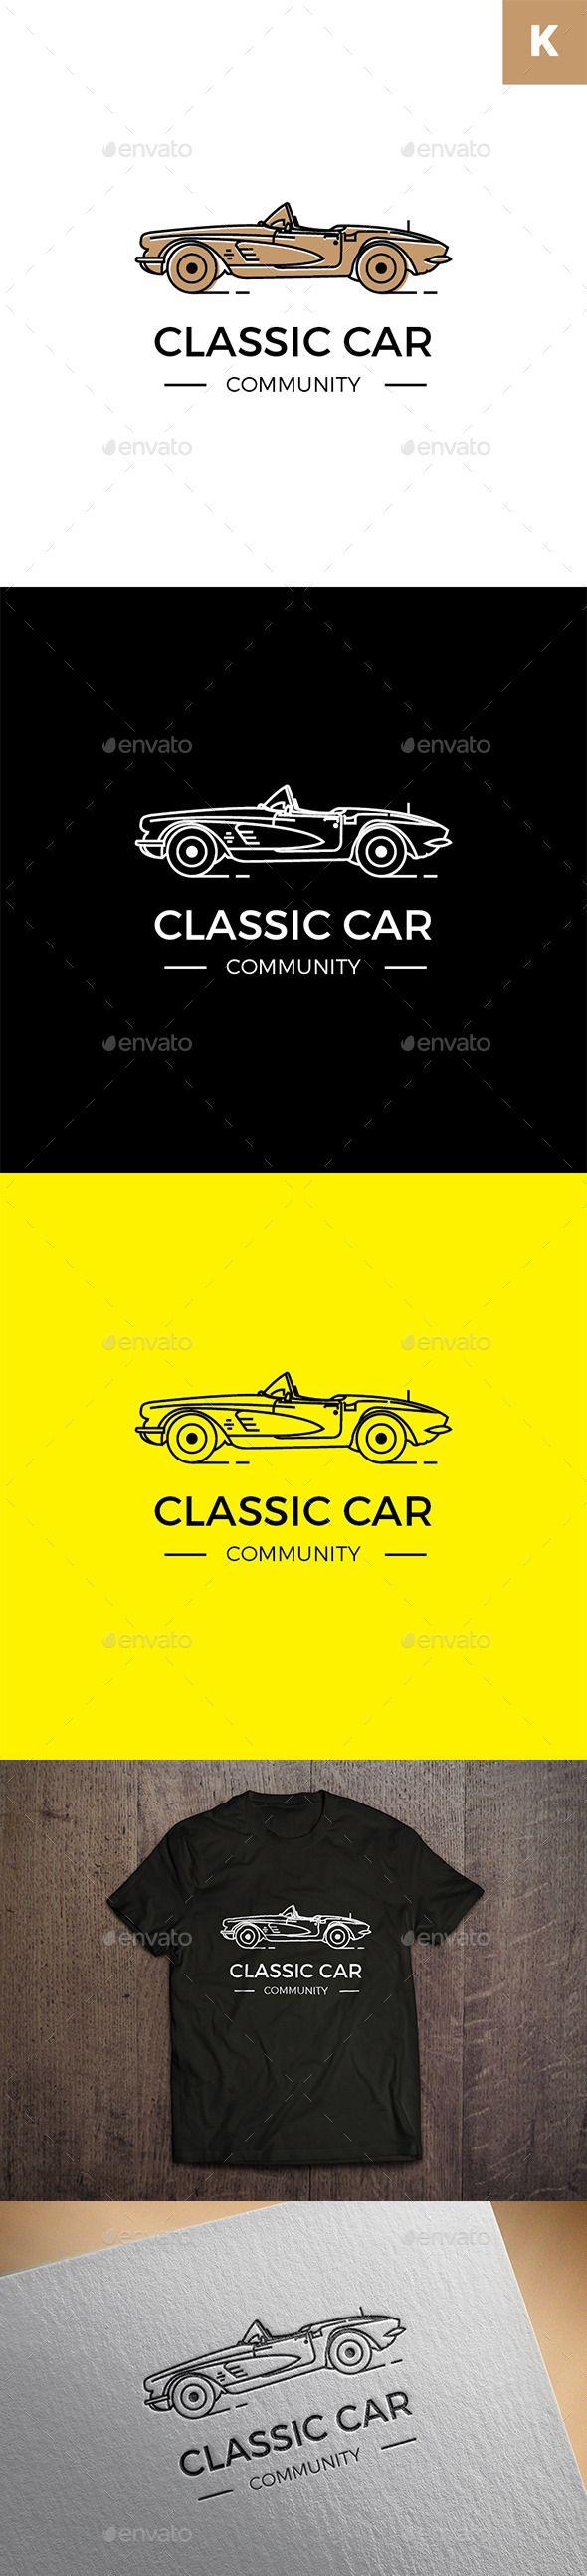 Classic Car Community Logo